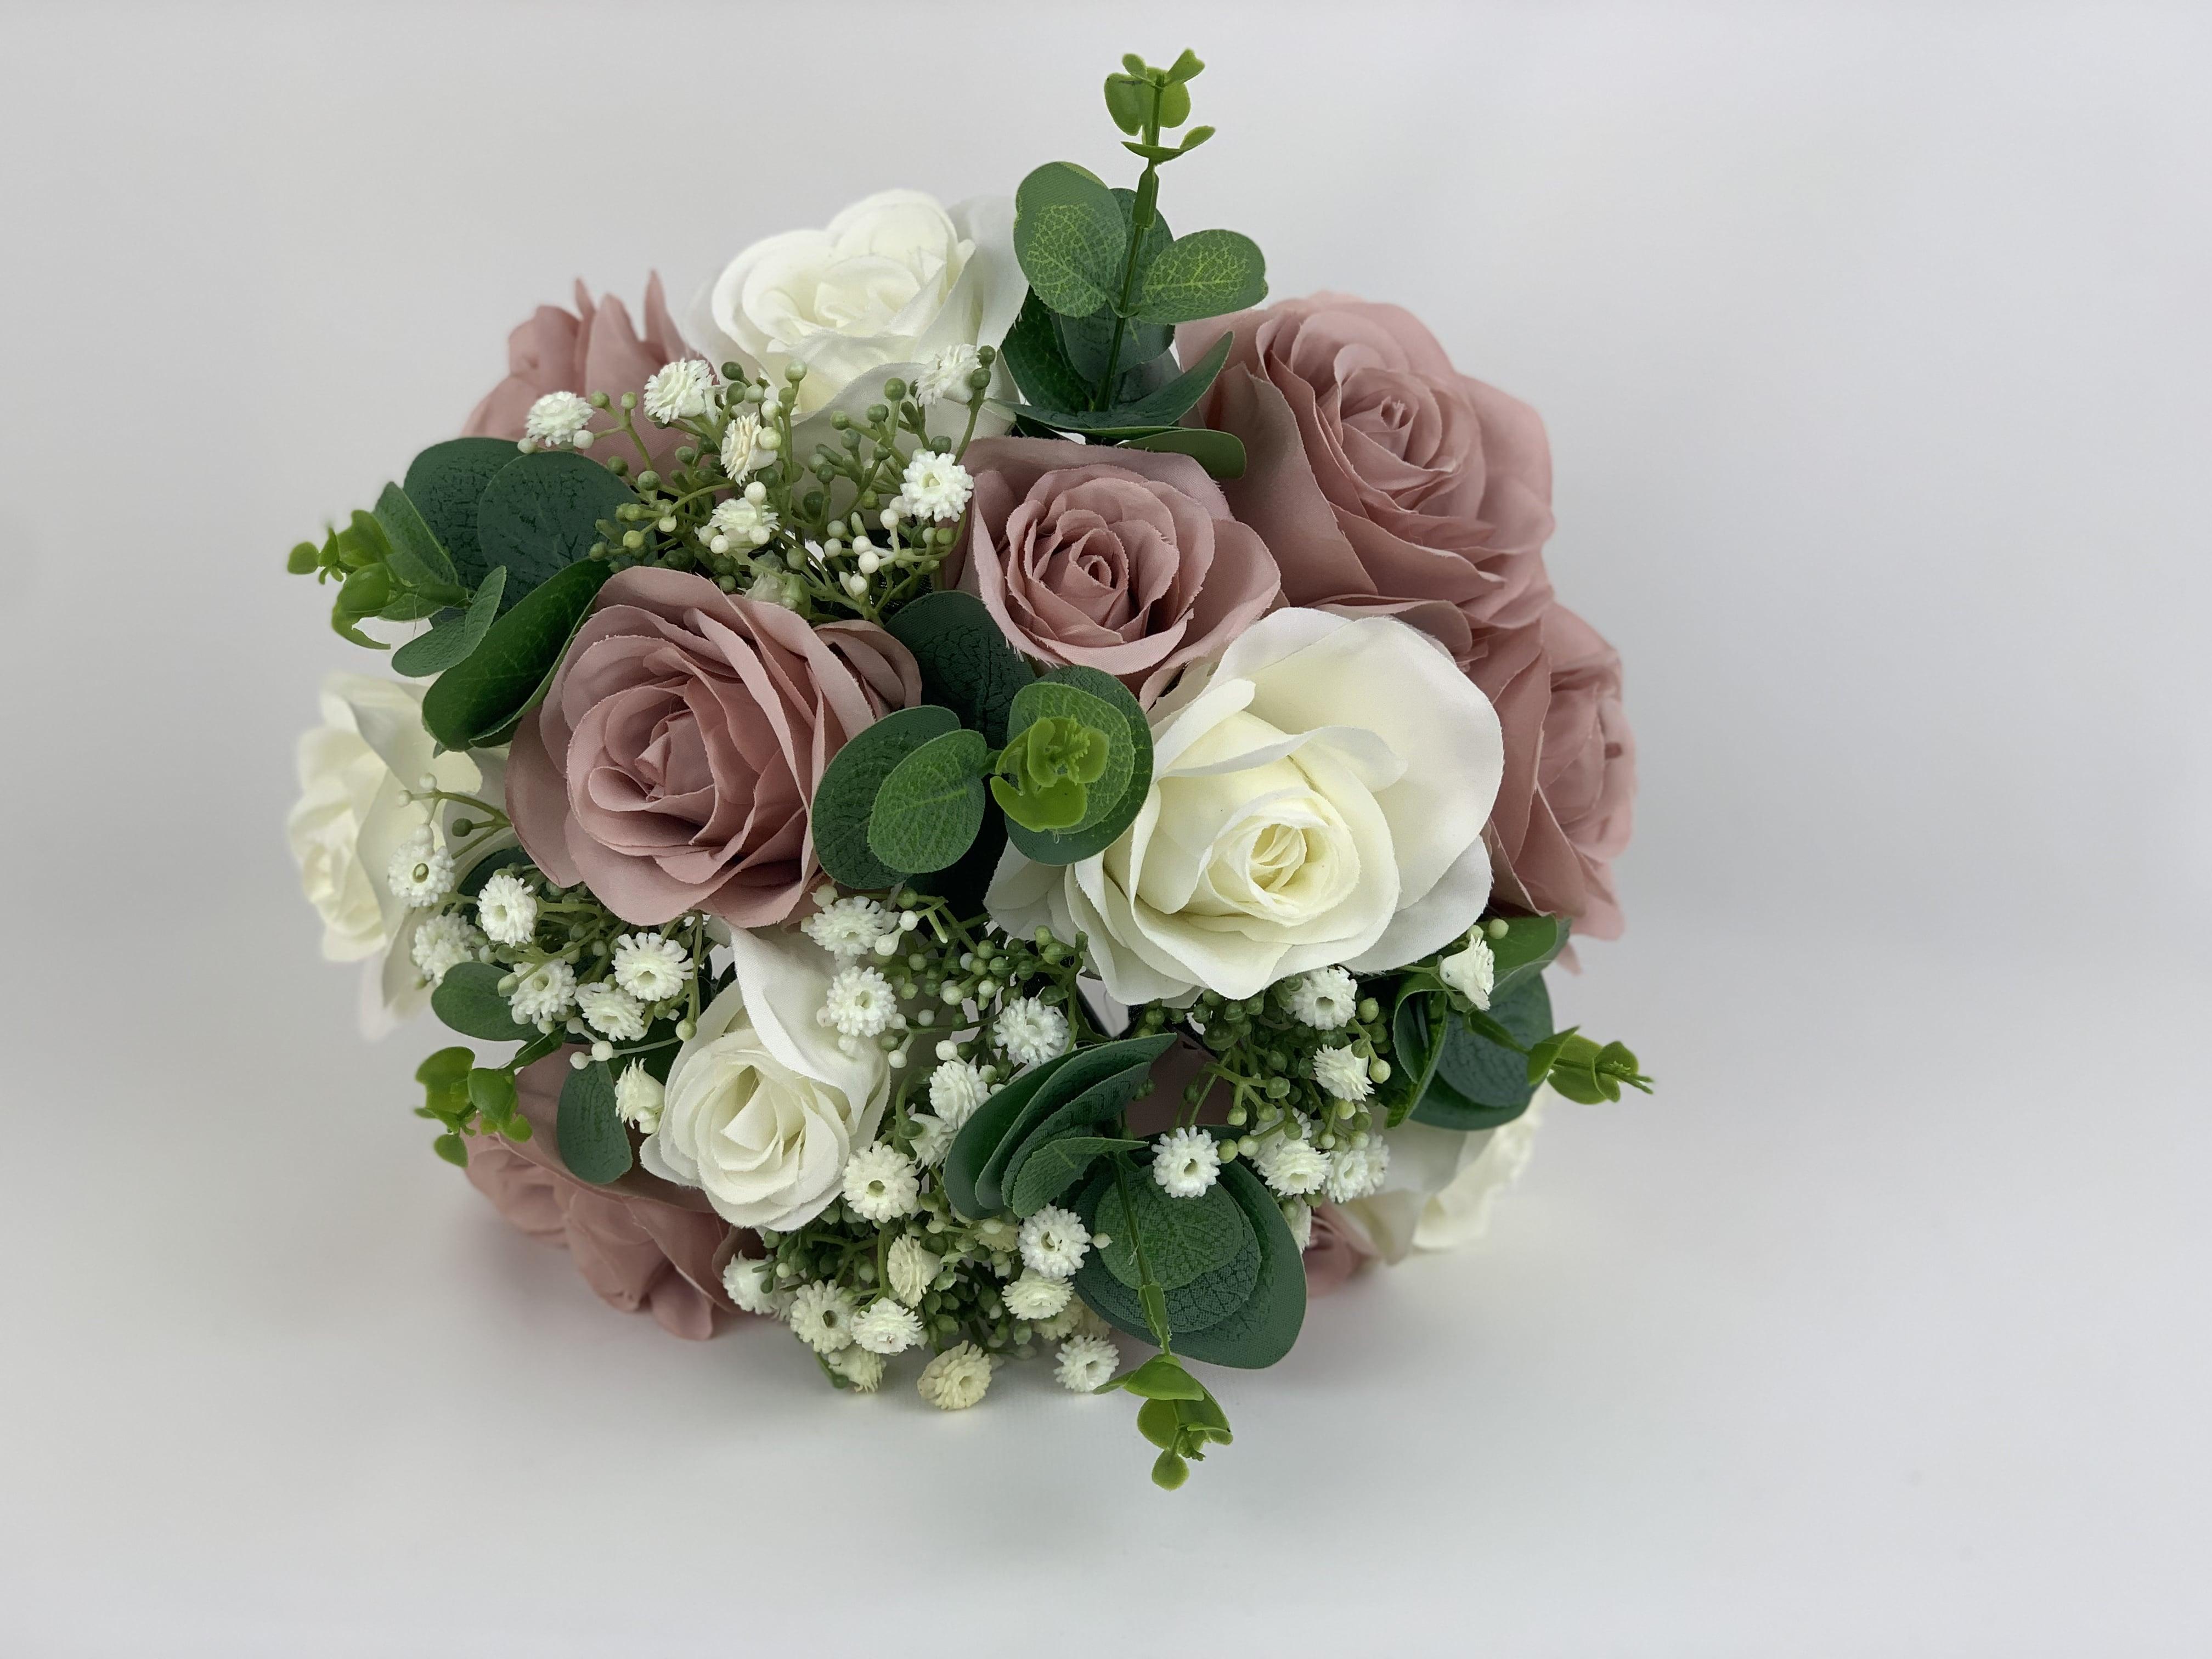 Artificial Wedding Flowers Package Silk Roses Gypsophila Eucalyptus